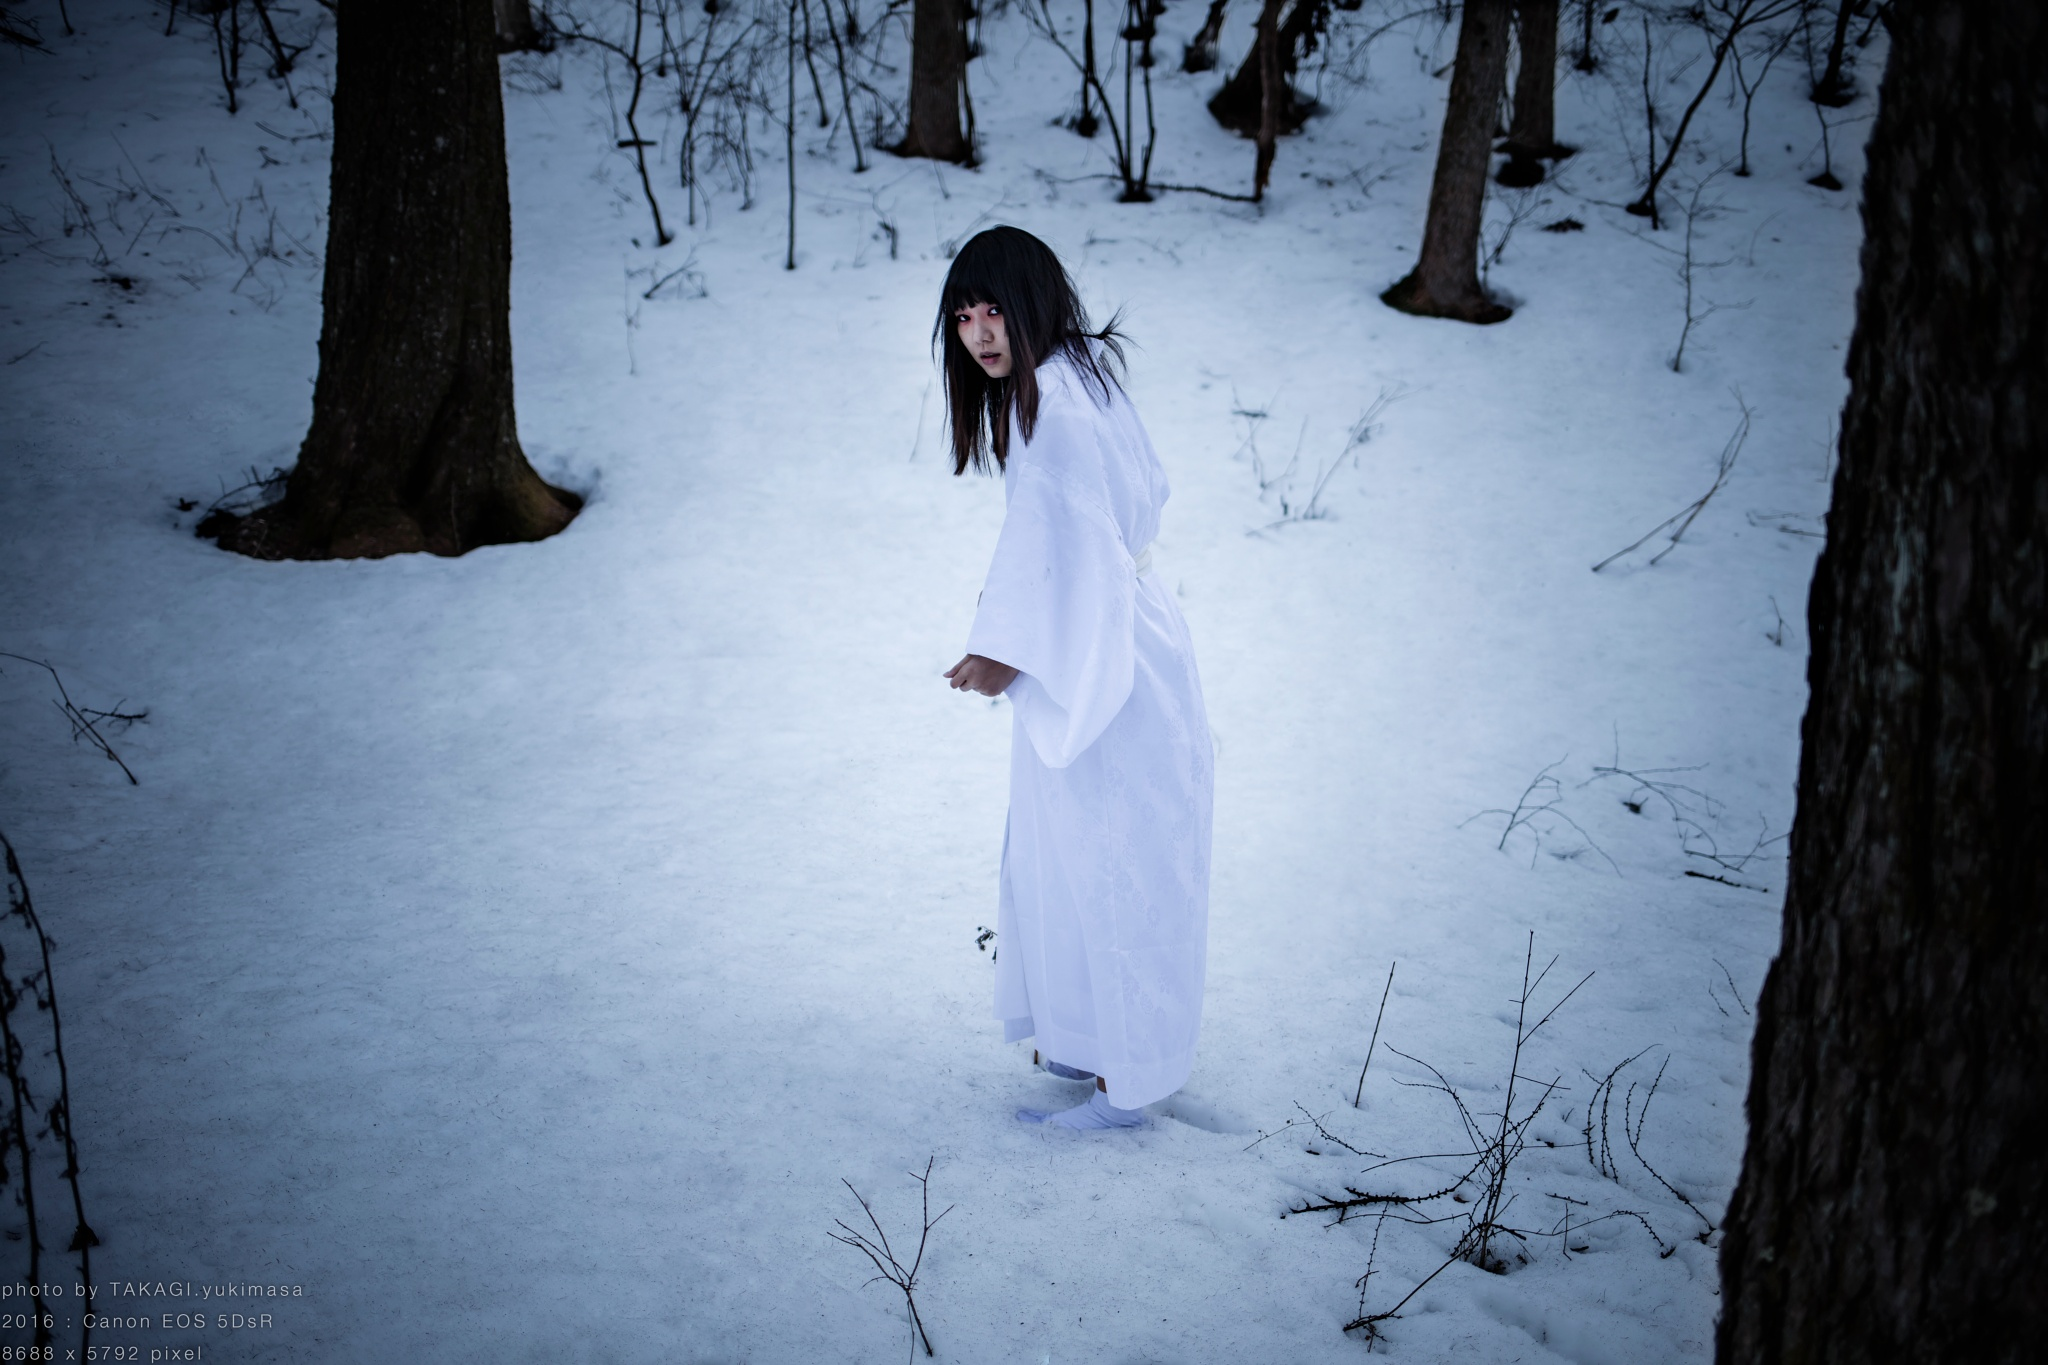 Snow Village by TAKAGIyukimasa